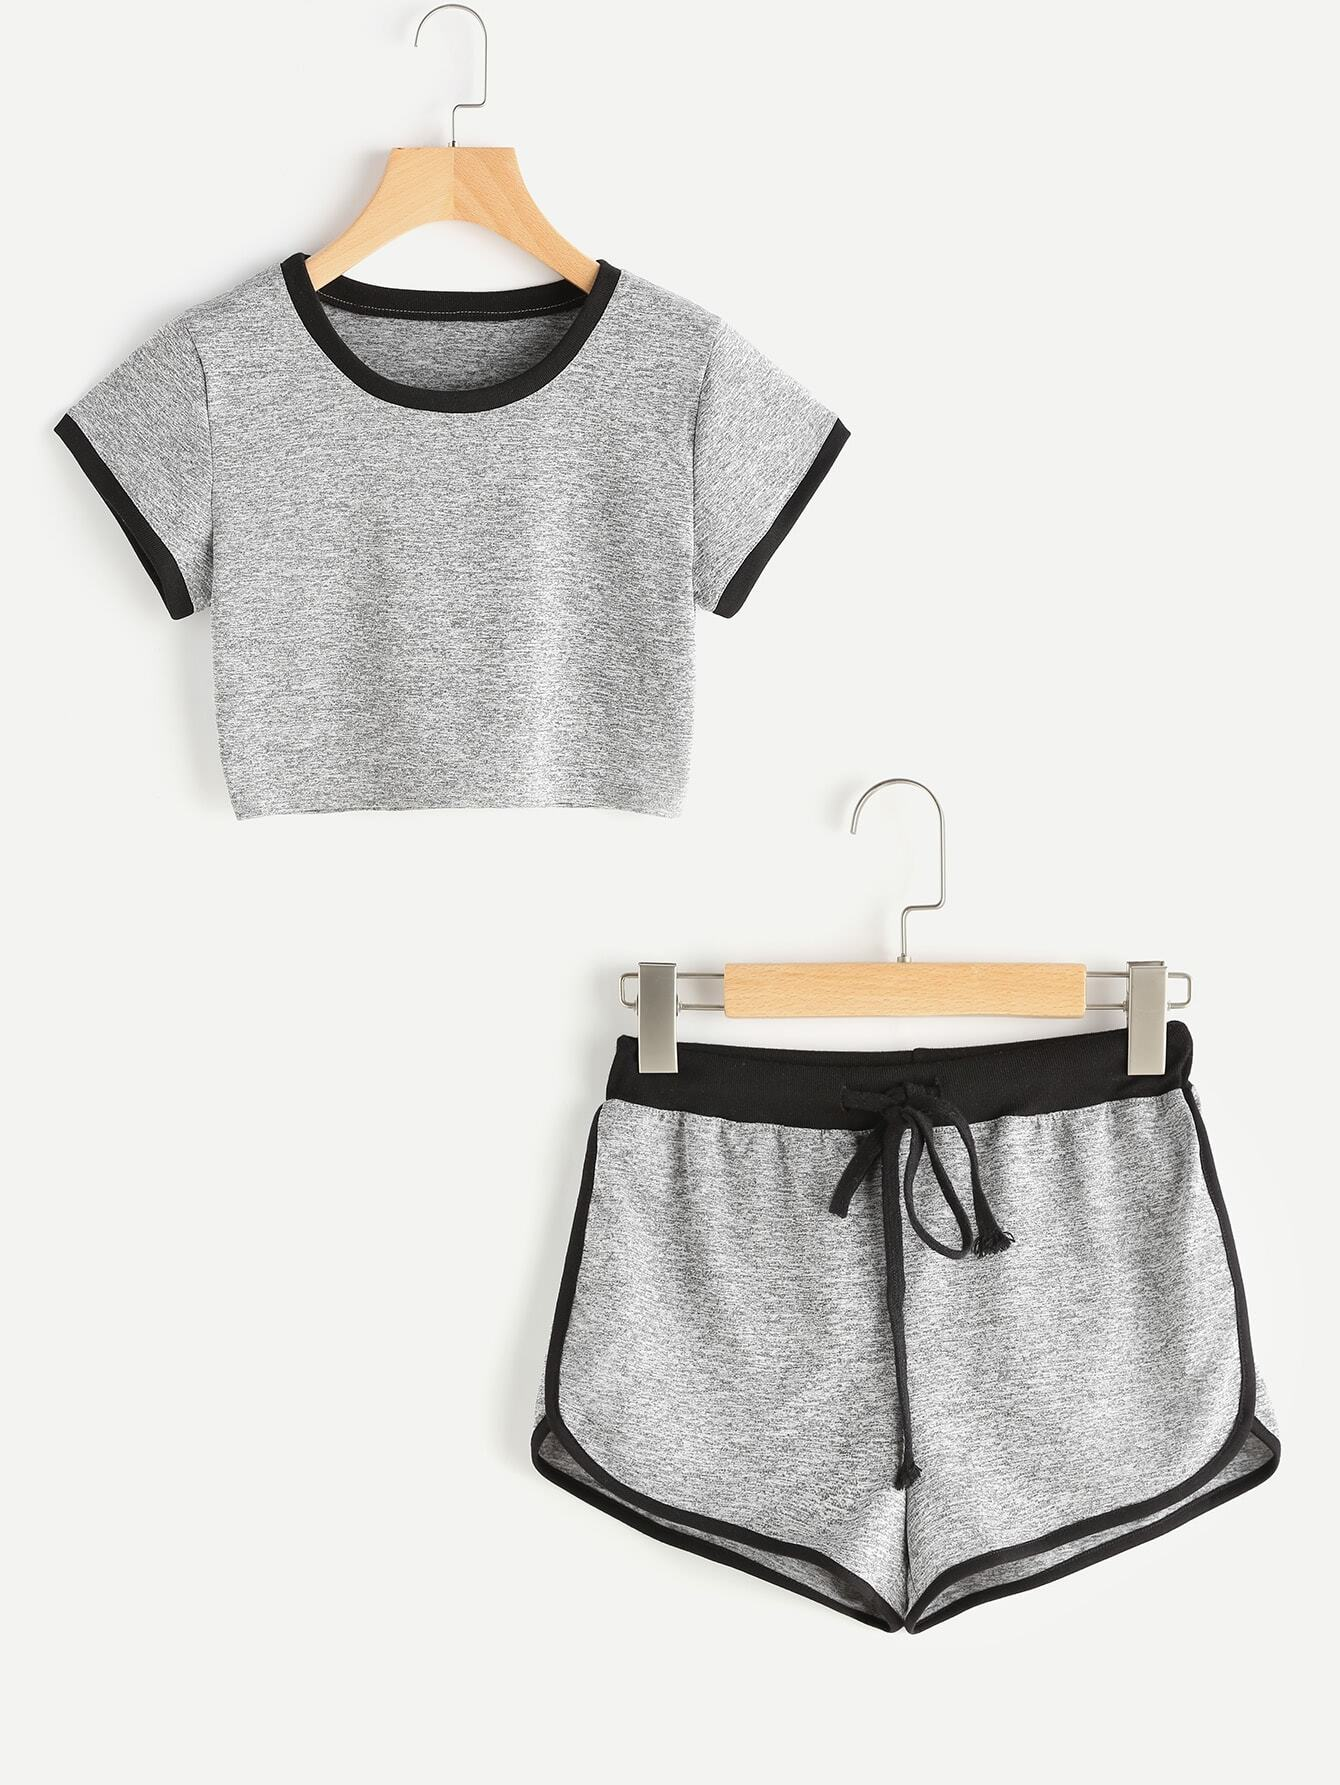 Ringer Crop Tee With Dolphin Hem Shorts -SheIn(Sheinside)